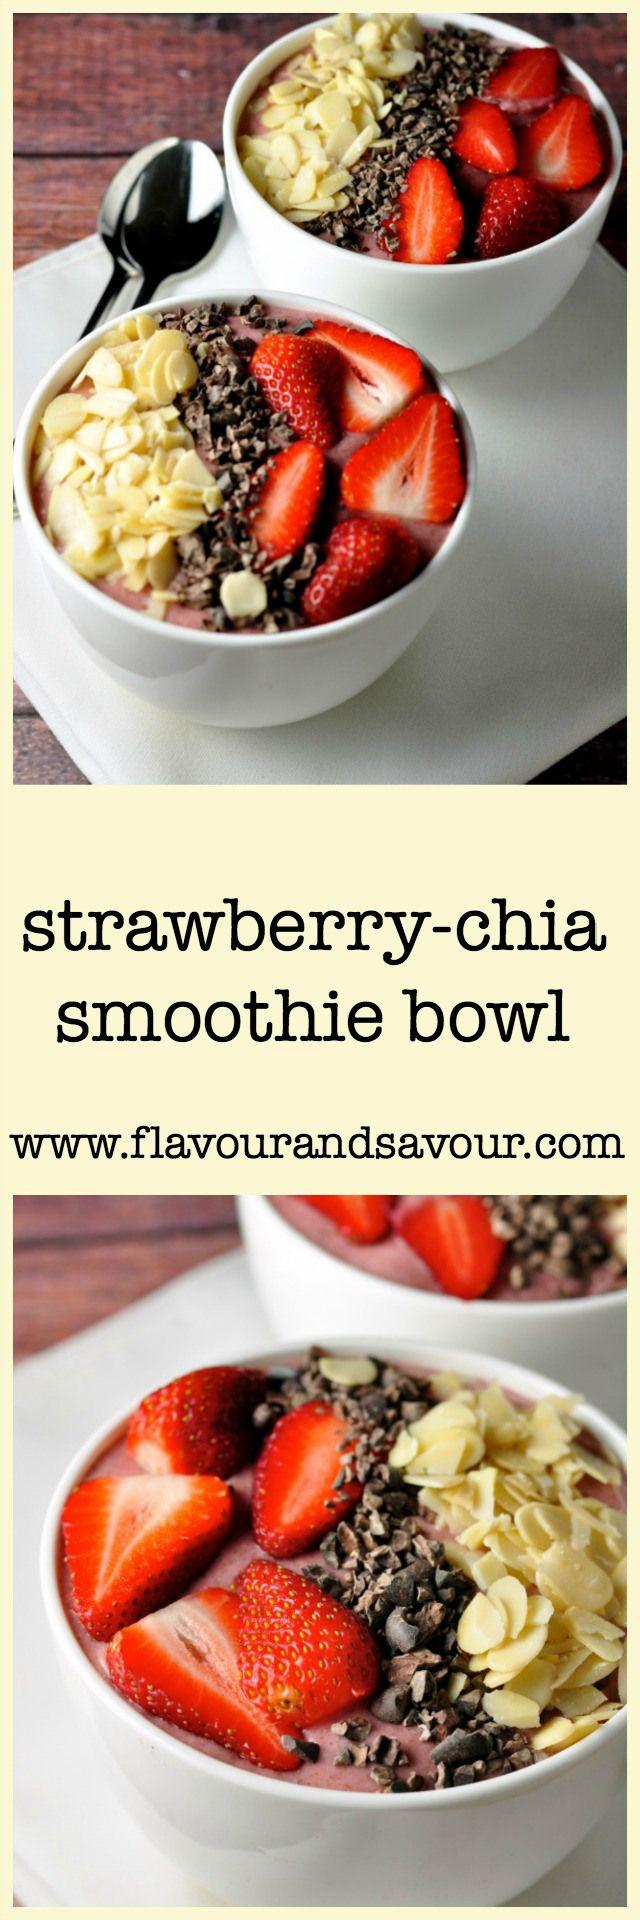 Paleo Strawberry-Chia Smoothie Bowl   #paleo #grainfree #glutenfree